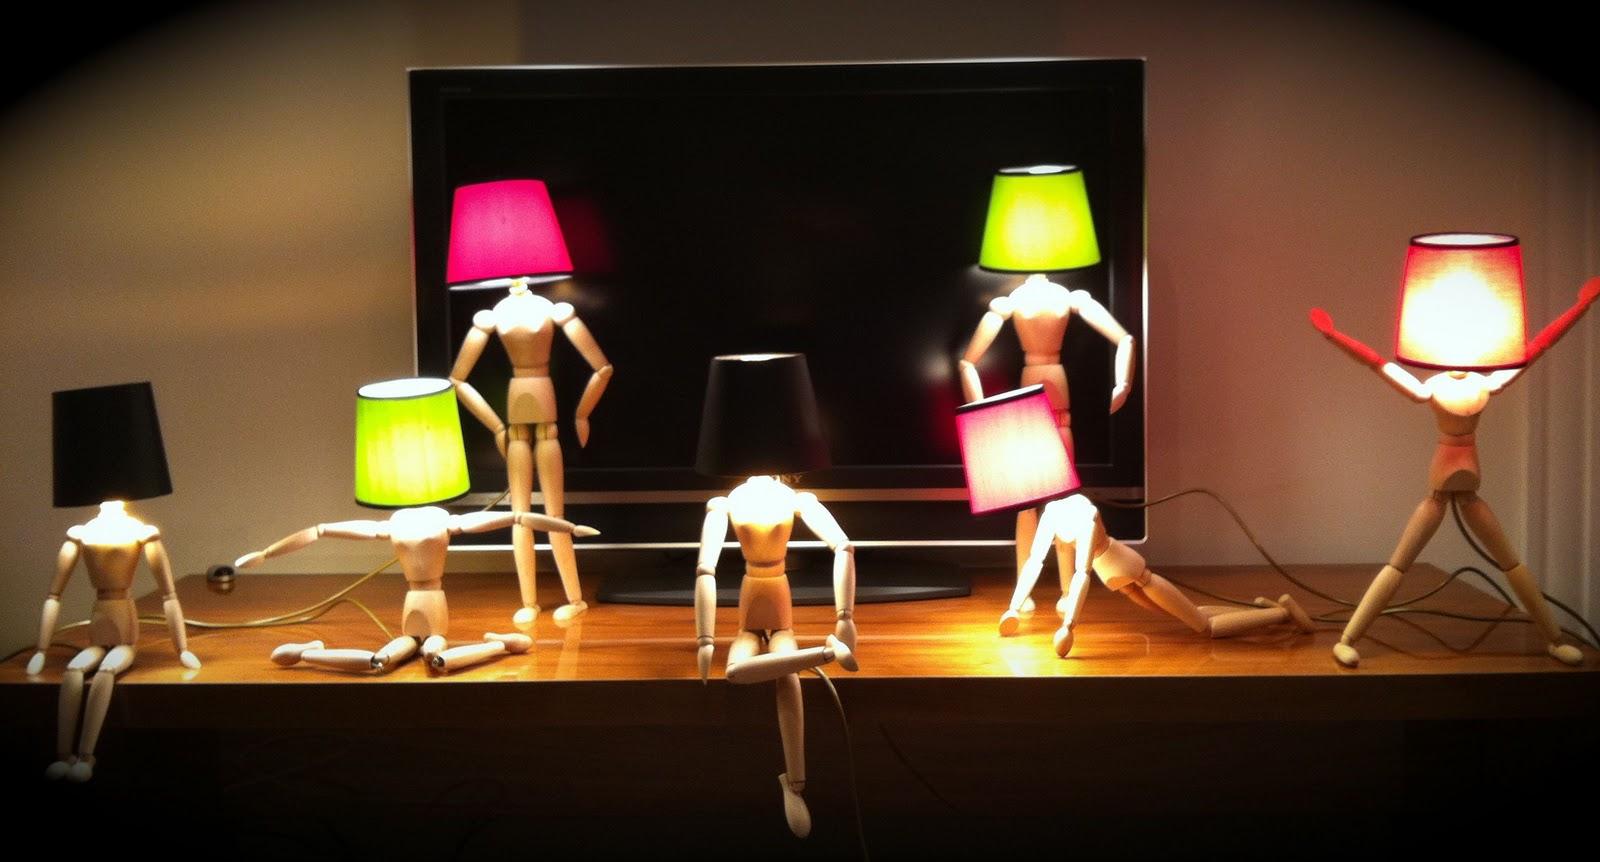 Mannequin Lamp godiva boutique: mannequin lamps